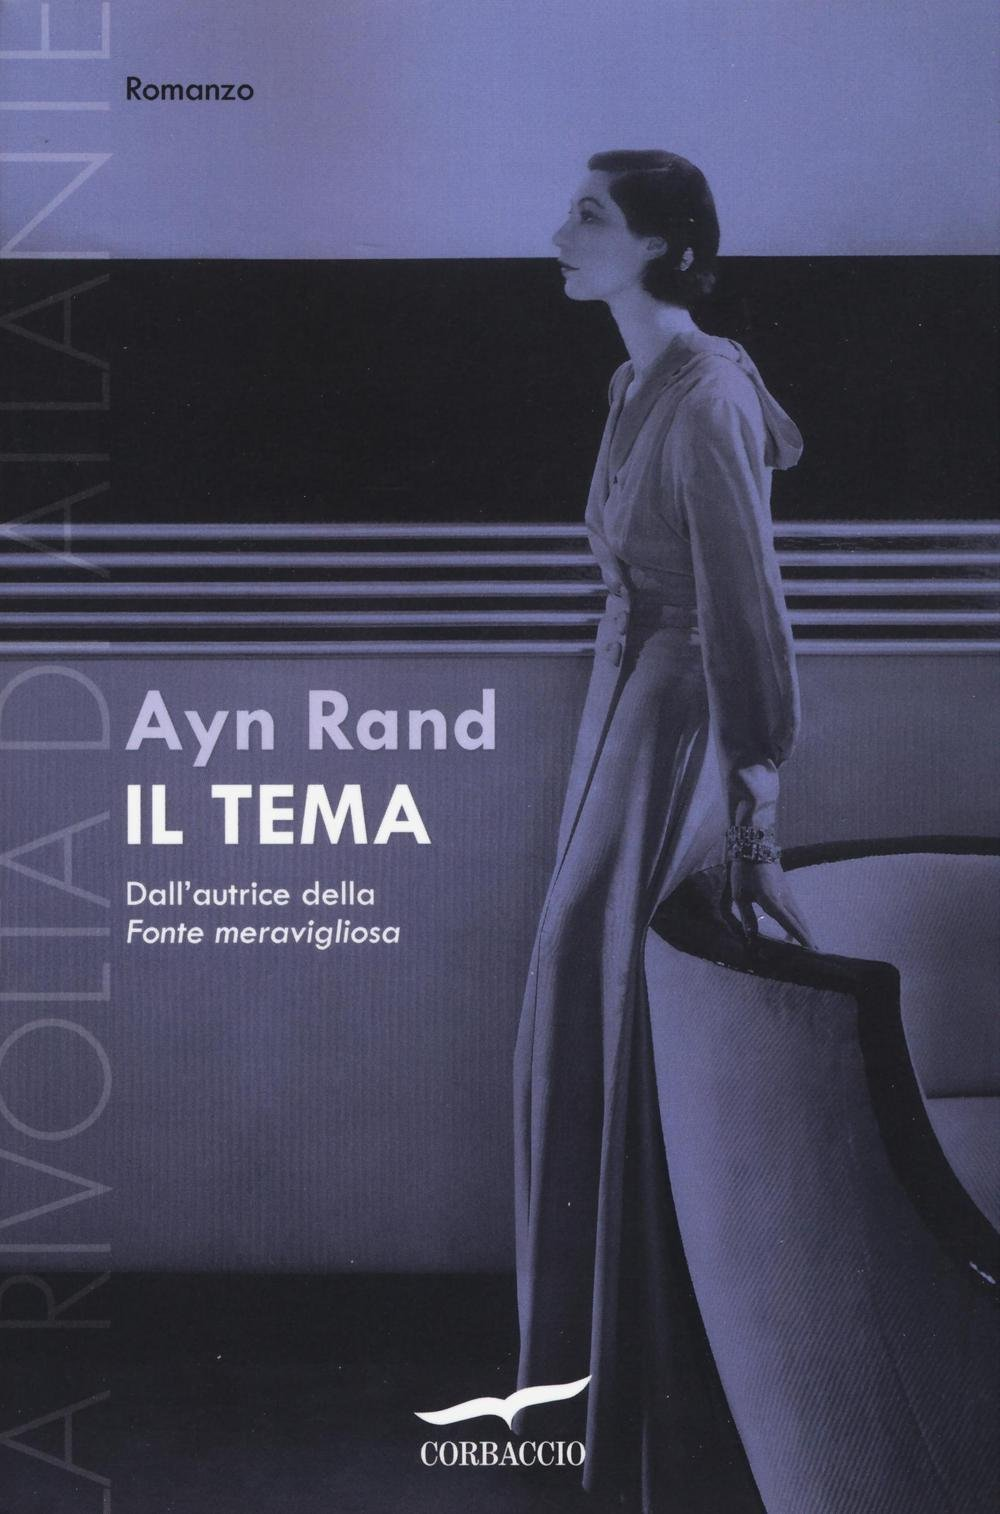 IL tema - Ayn Rand.jpg